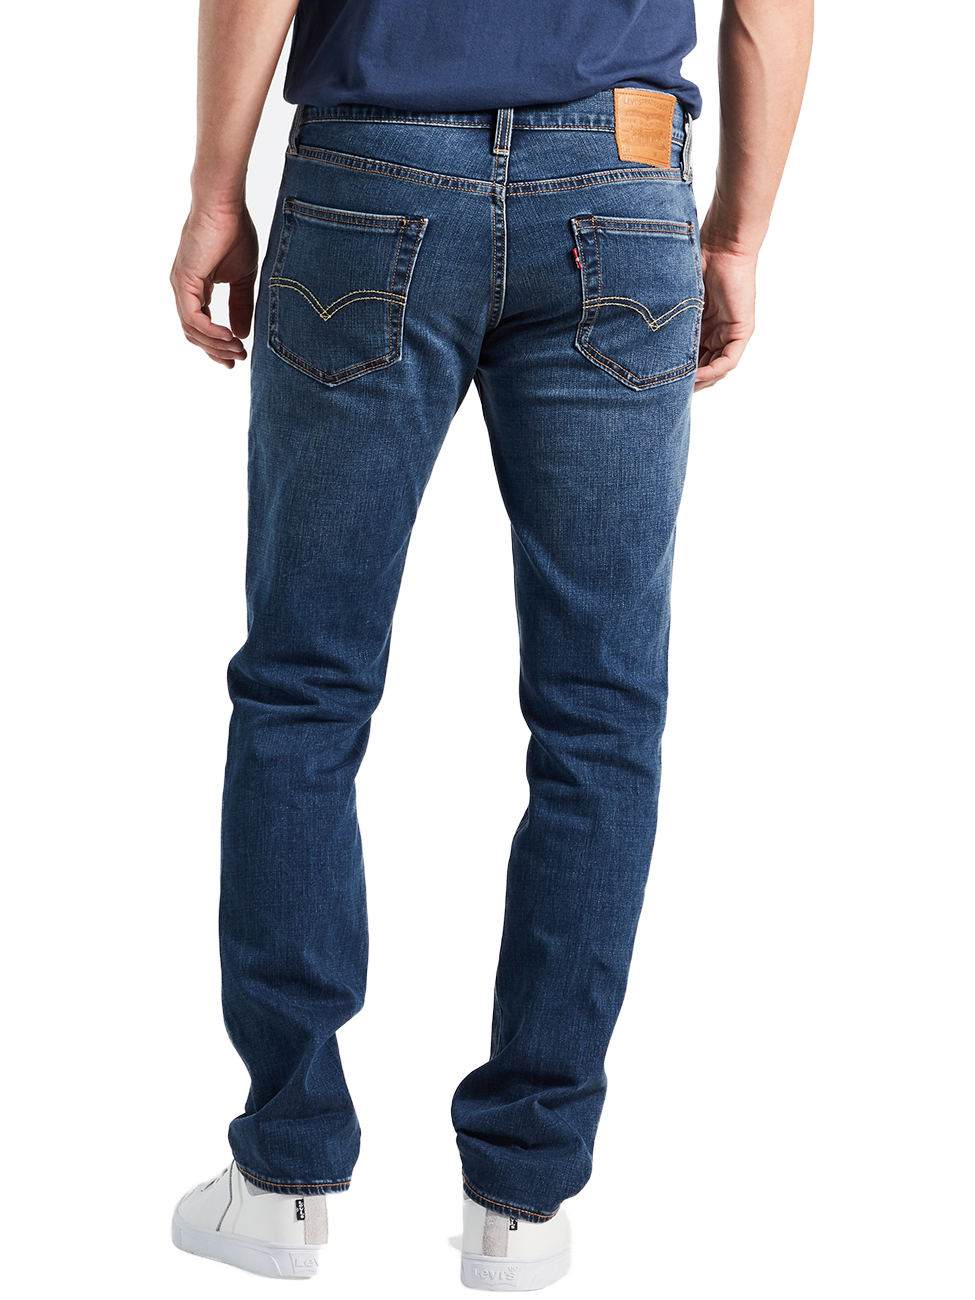 levis-herren-jeans-511-slim-fit-blau-caspian-adapt